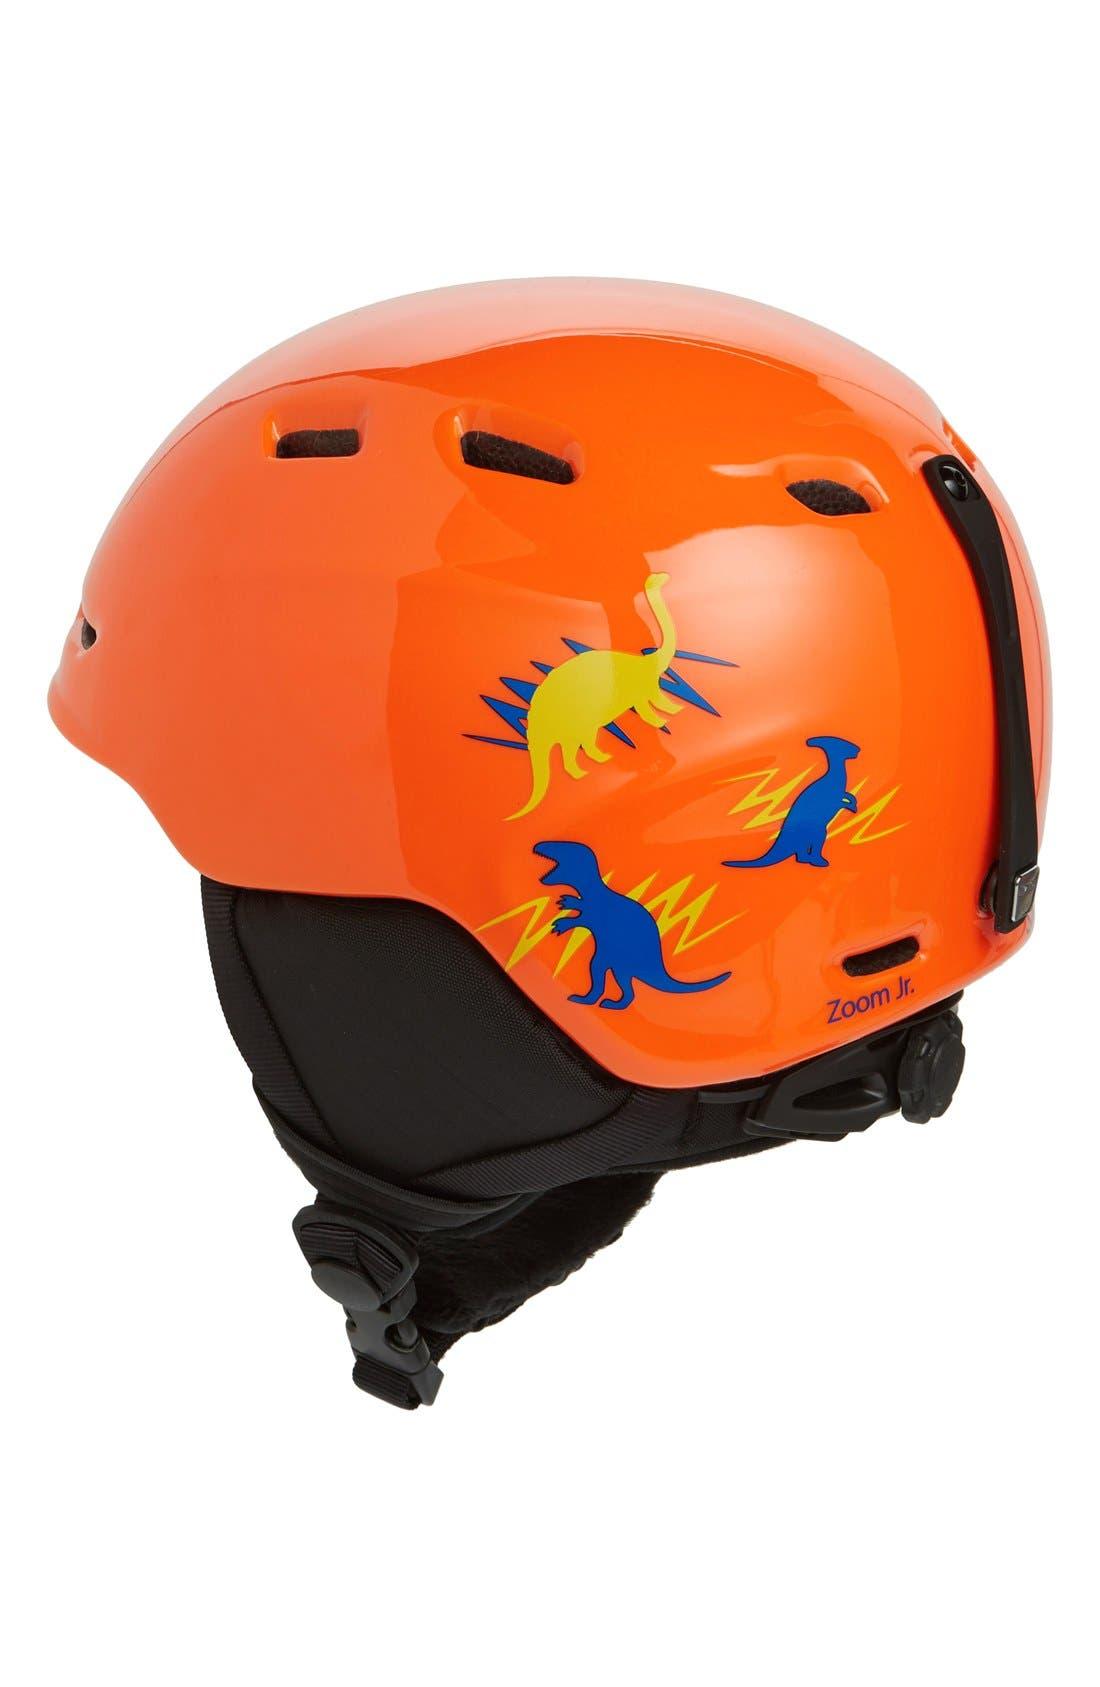 'Zoom Jr.' Snow Helmet,                             Alternate thumbnail 4, color,